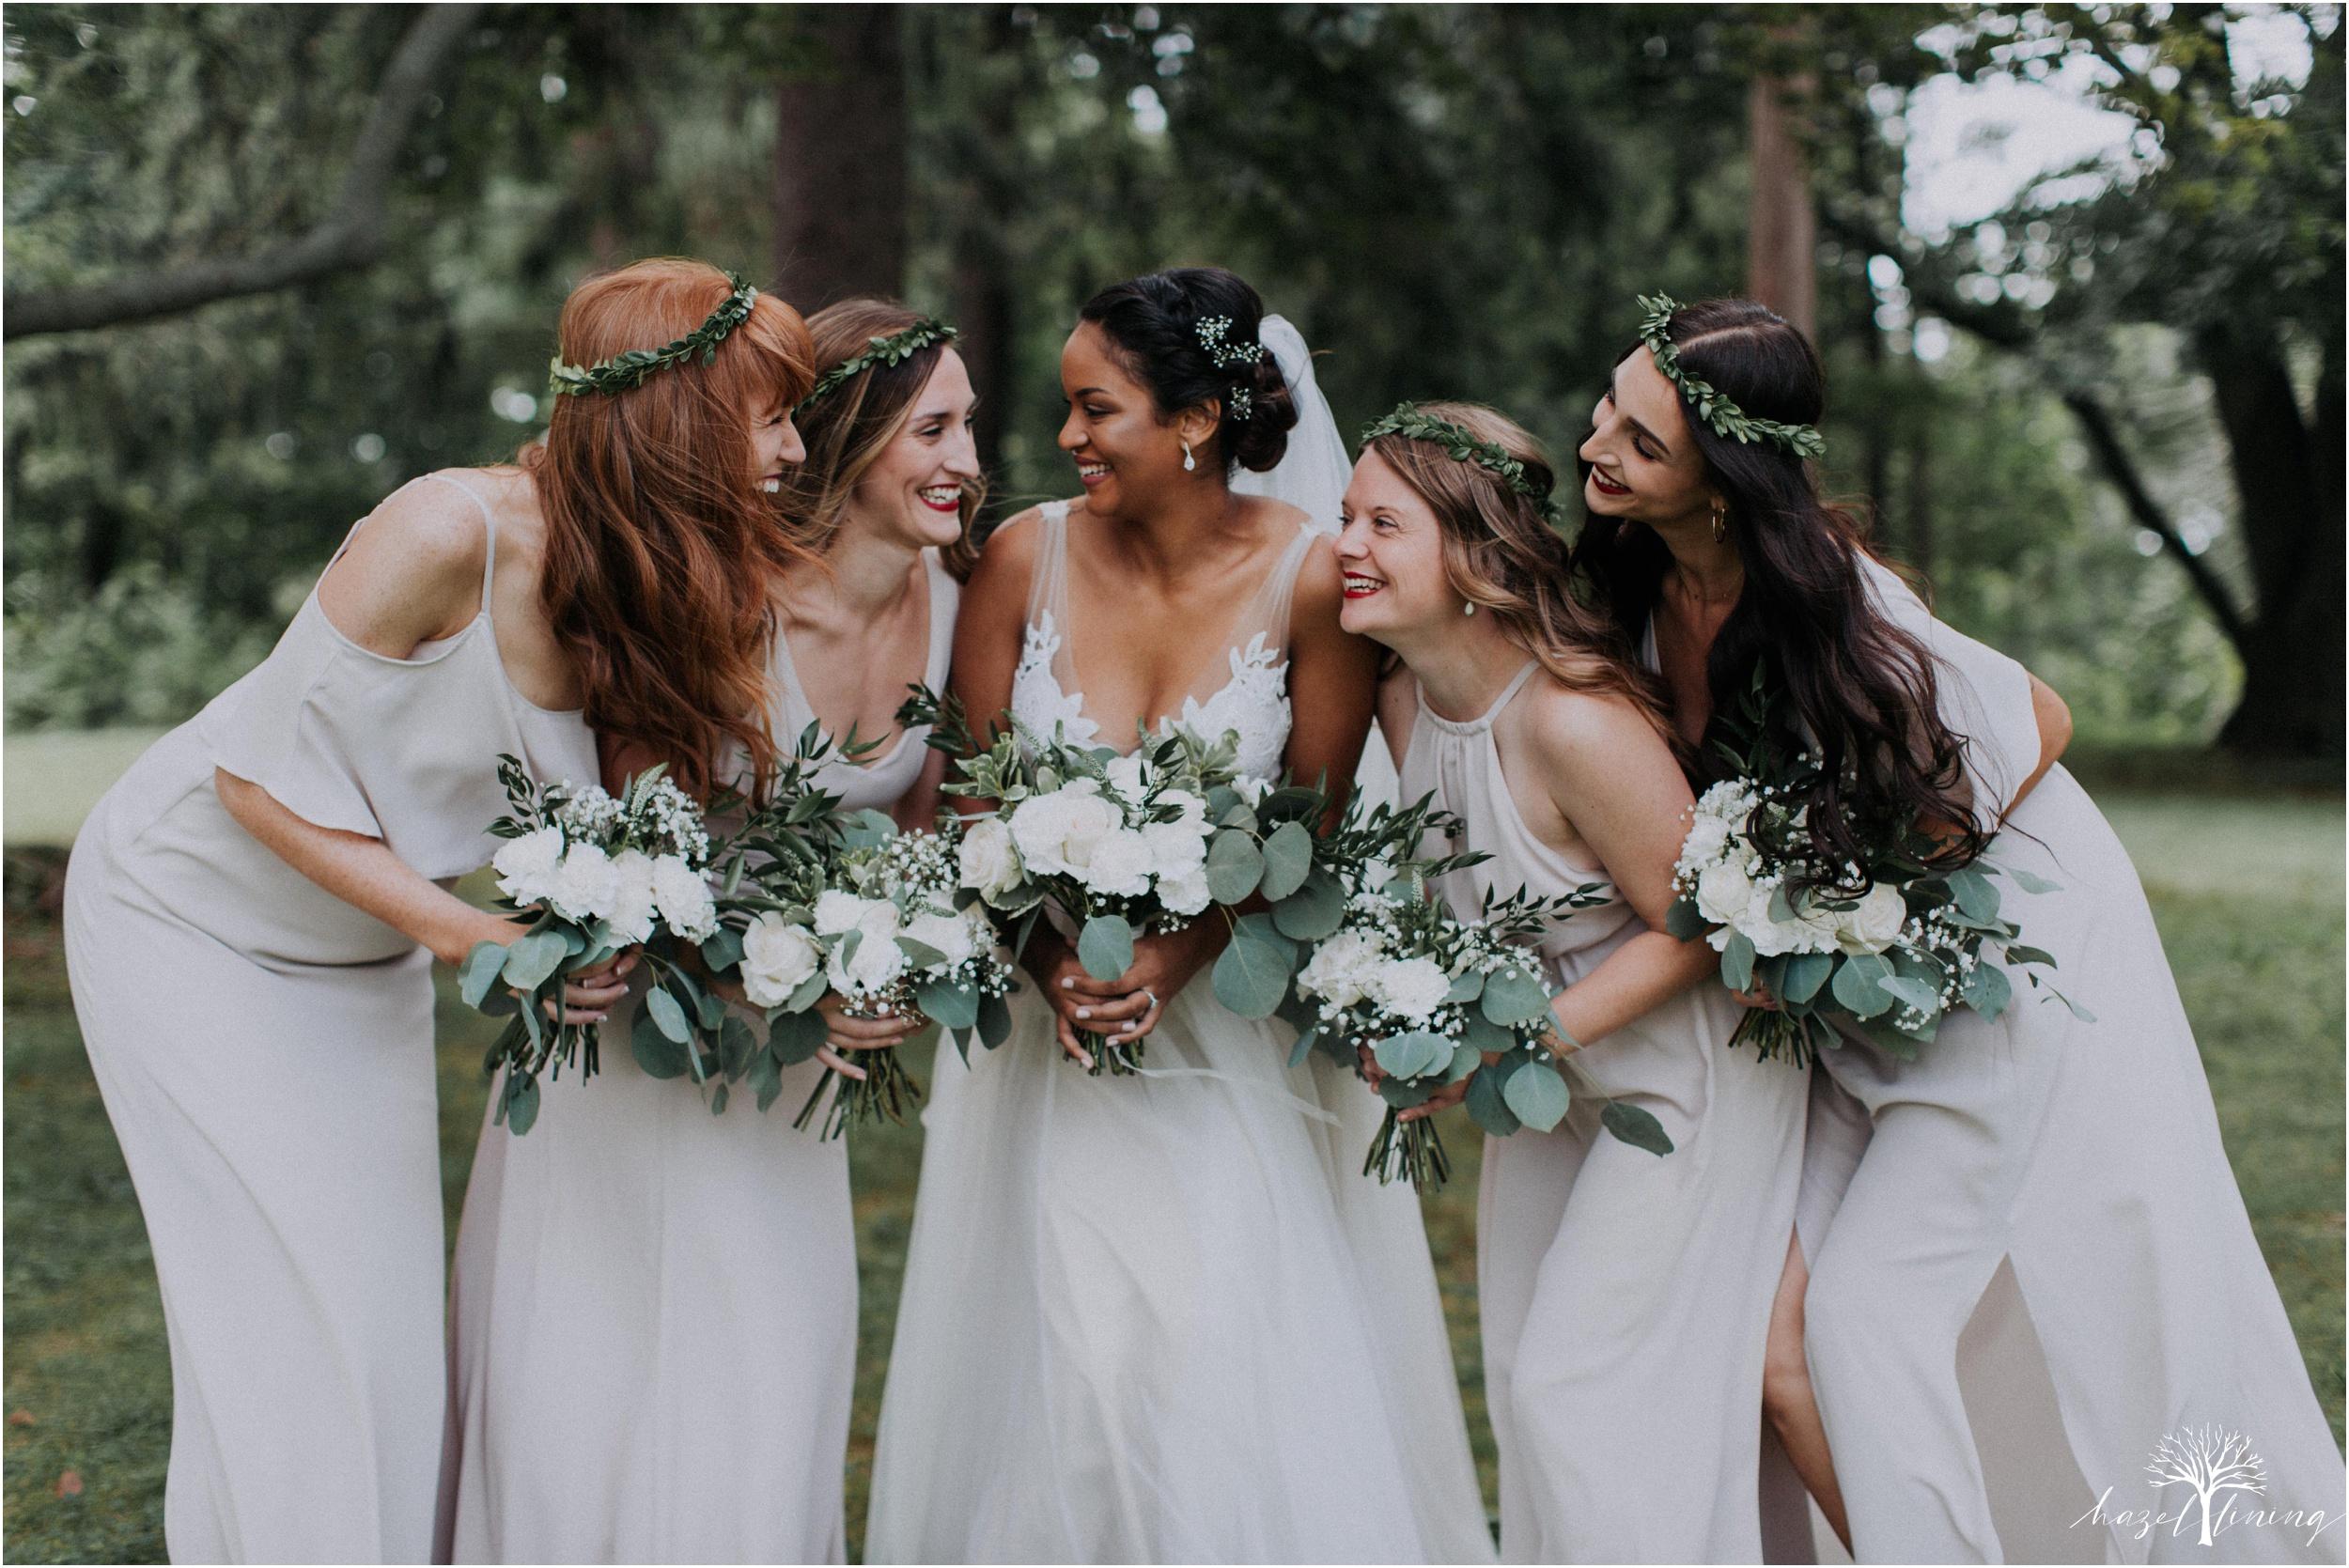 mariah-kreyling-samuel-sherratt-sherrattwiththeworld-peirce-farm-at-witch-hill-boston-massachusetts-wedding-photography-hazel-lining-travel-wedding-elopement-photography_0030.jpg